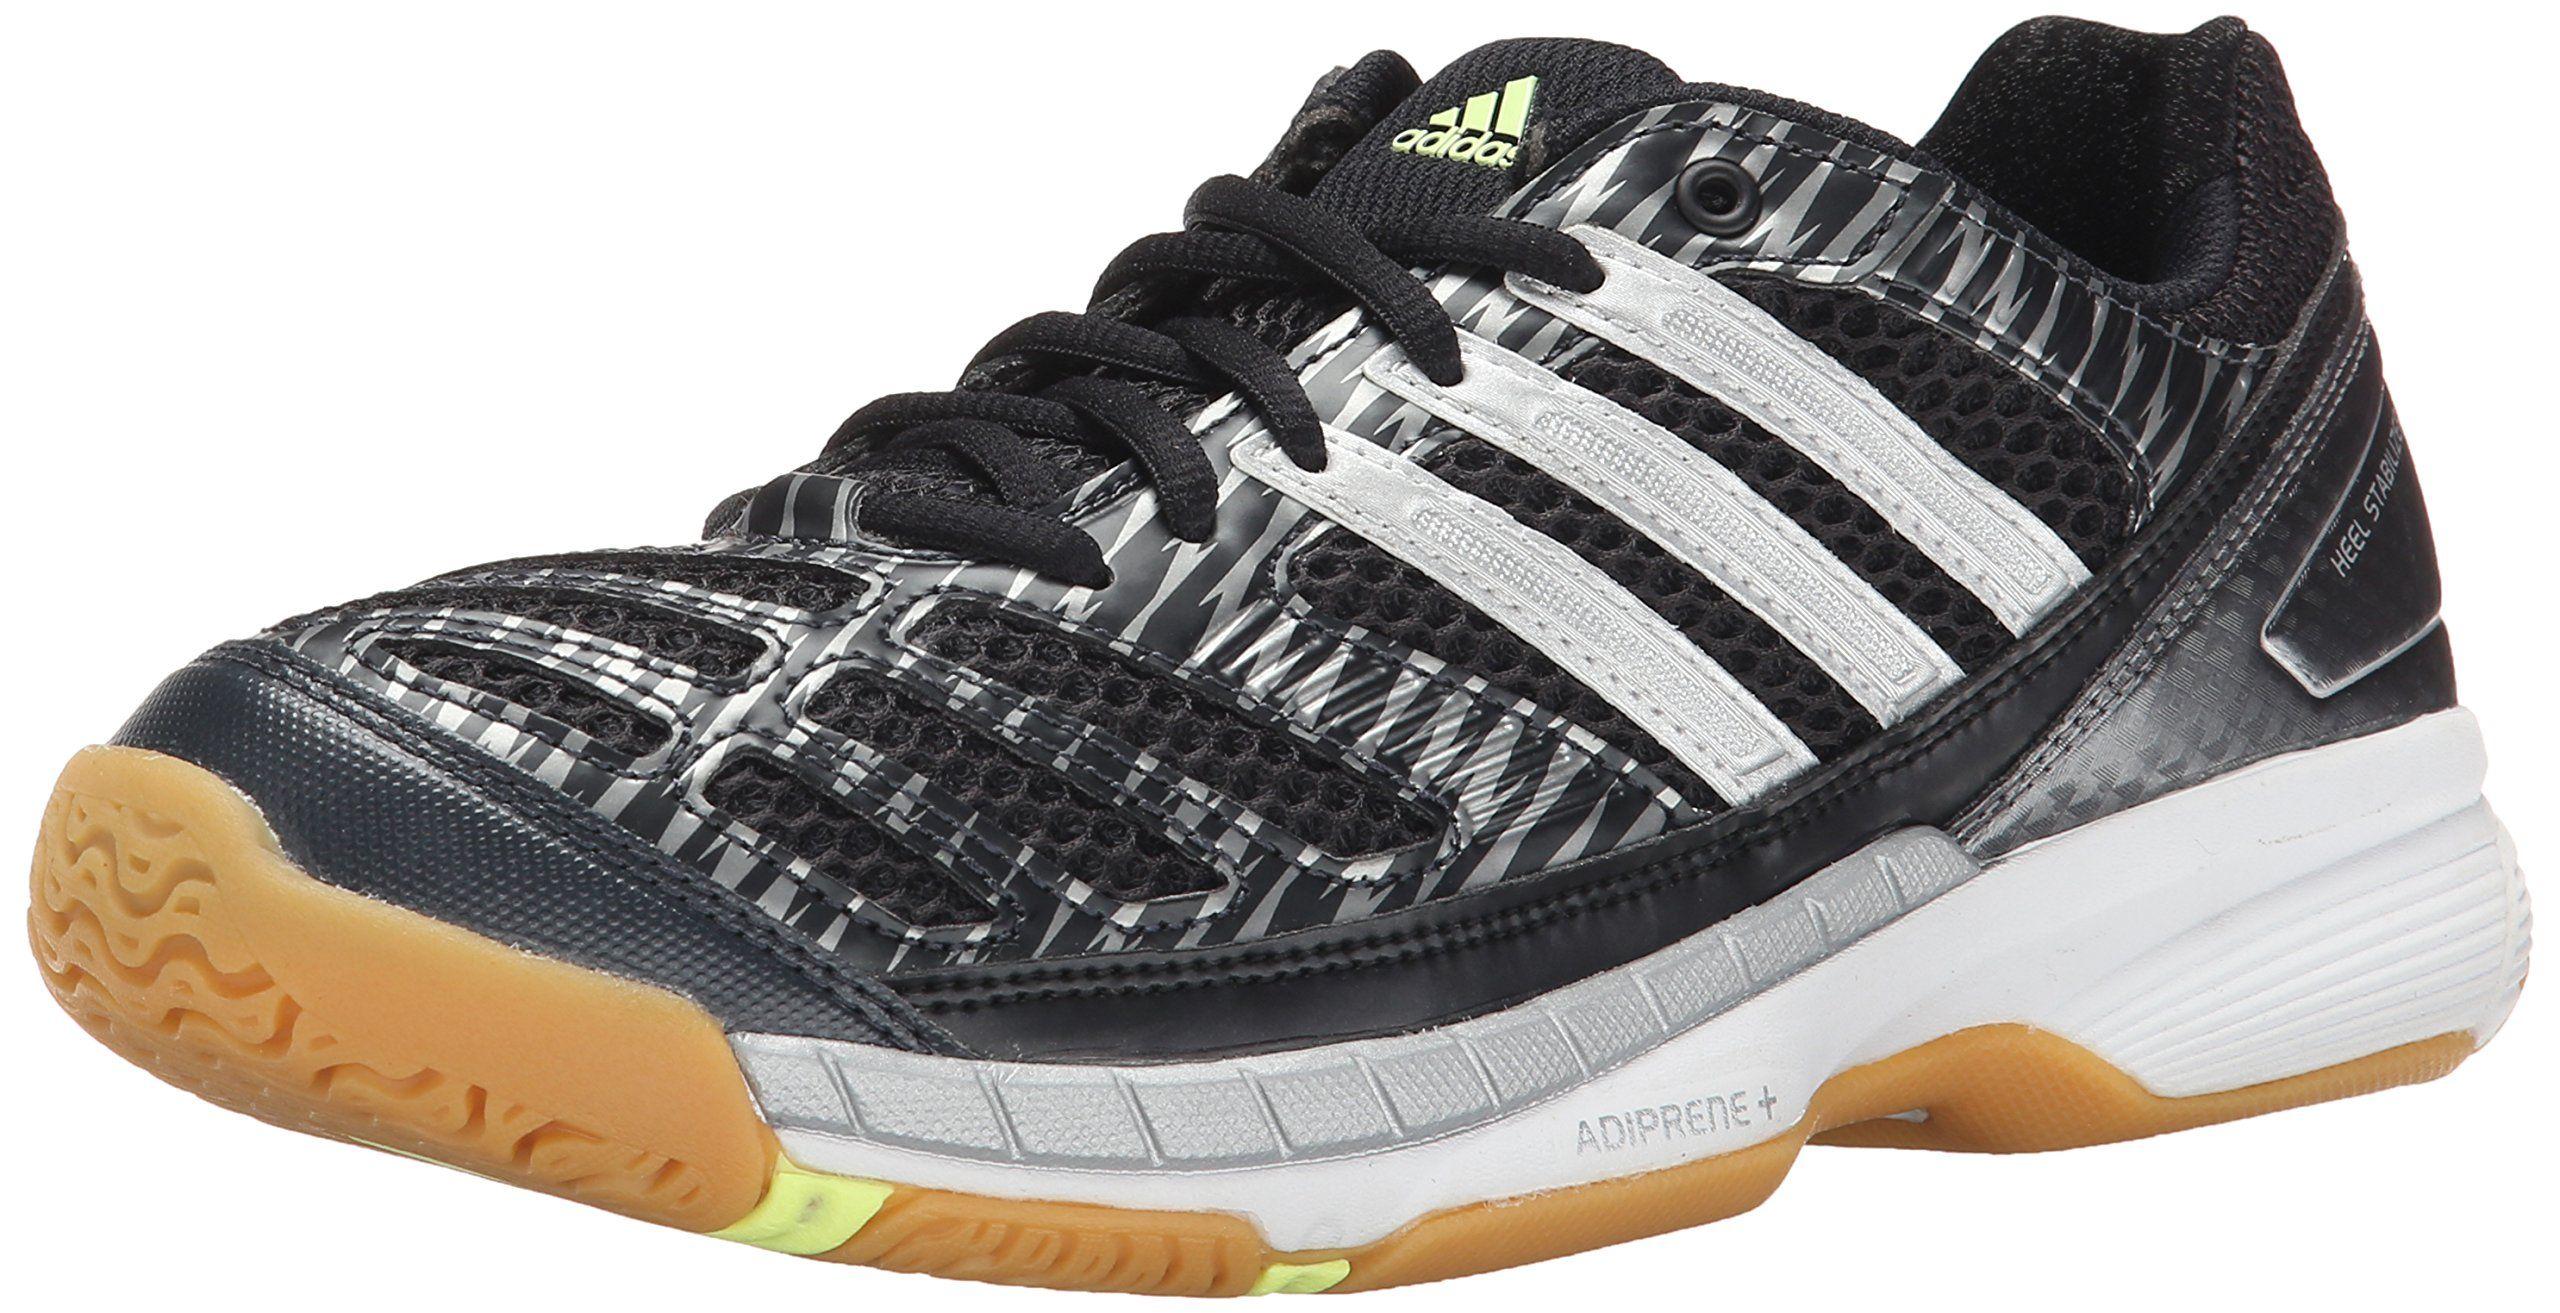 Adidas Performance Women S Volley Assault Shoe Black Silver Frozen Yellow 6 5 M Us Open Mesh Upper Womens Athletic Shoes Volleyball Shoes Athletic Shoes Nike